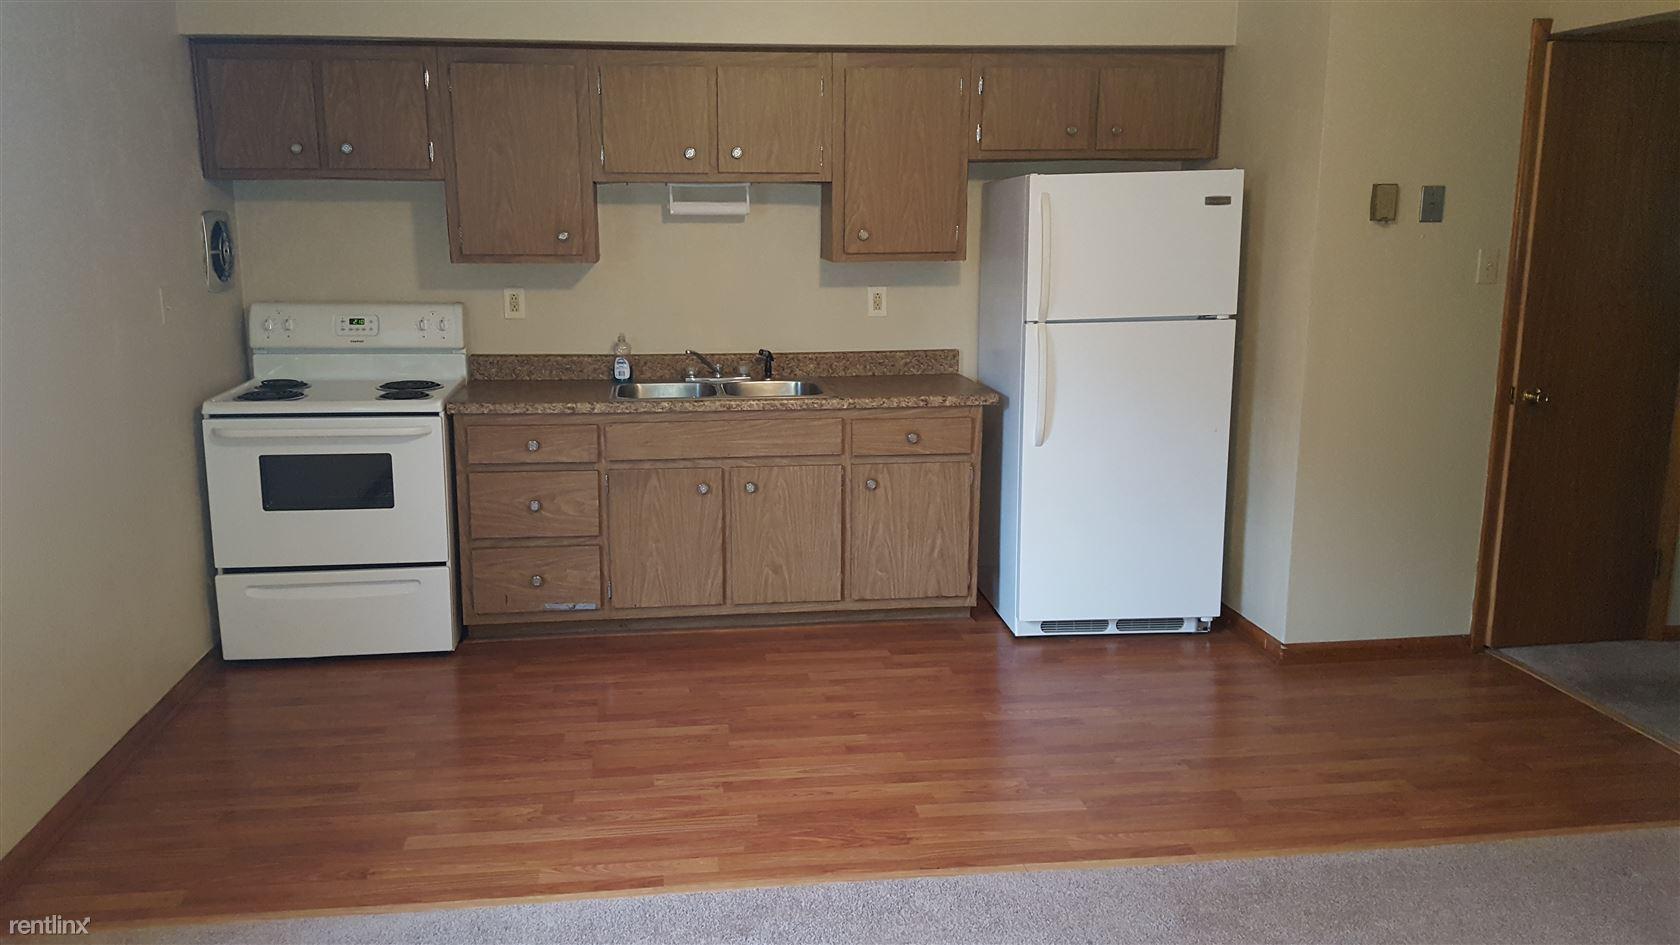 214 Greenside Ave Apt 2, Canonsburg, PA - $985